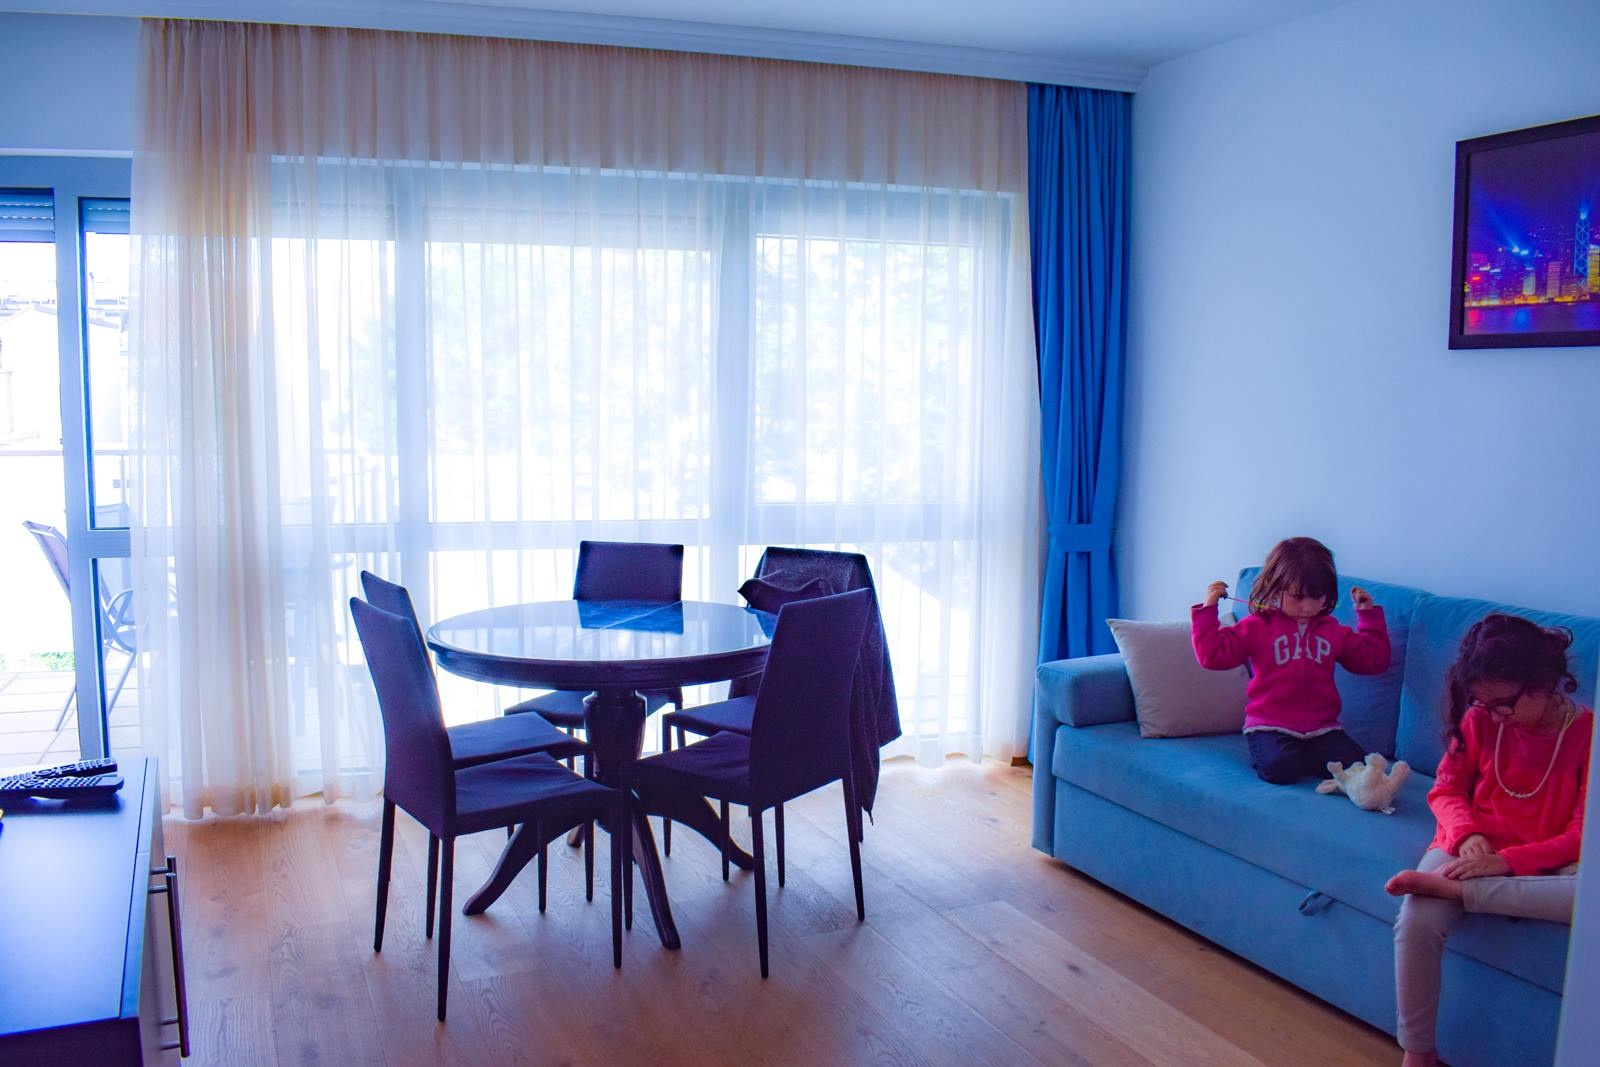 Appartement vienne autriche pas cher voyage trip grandblog